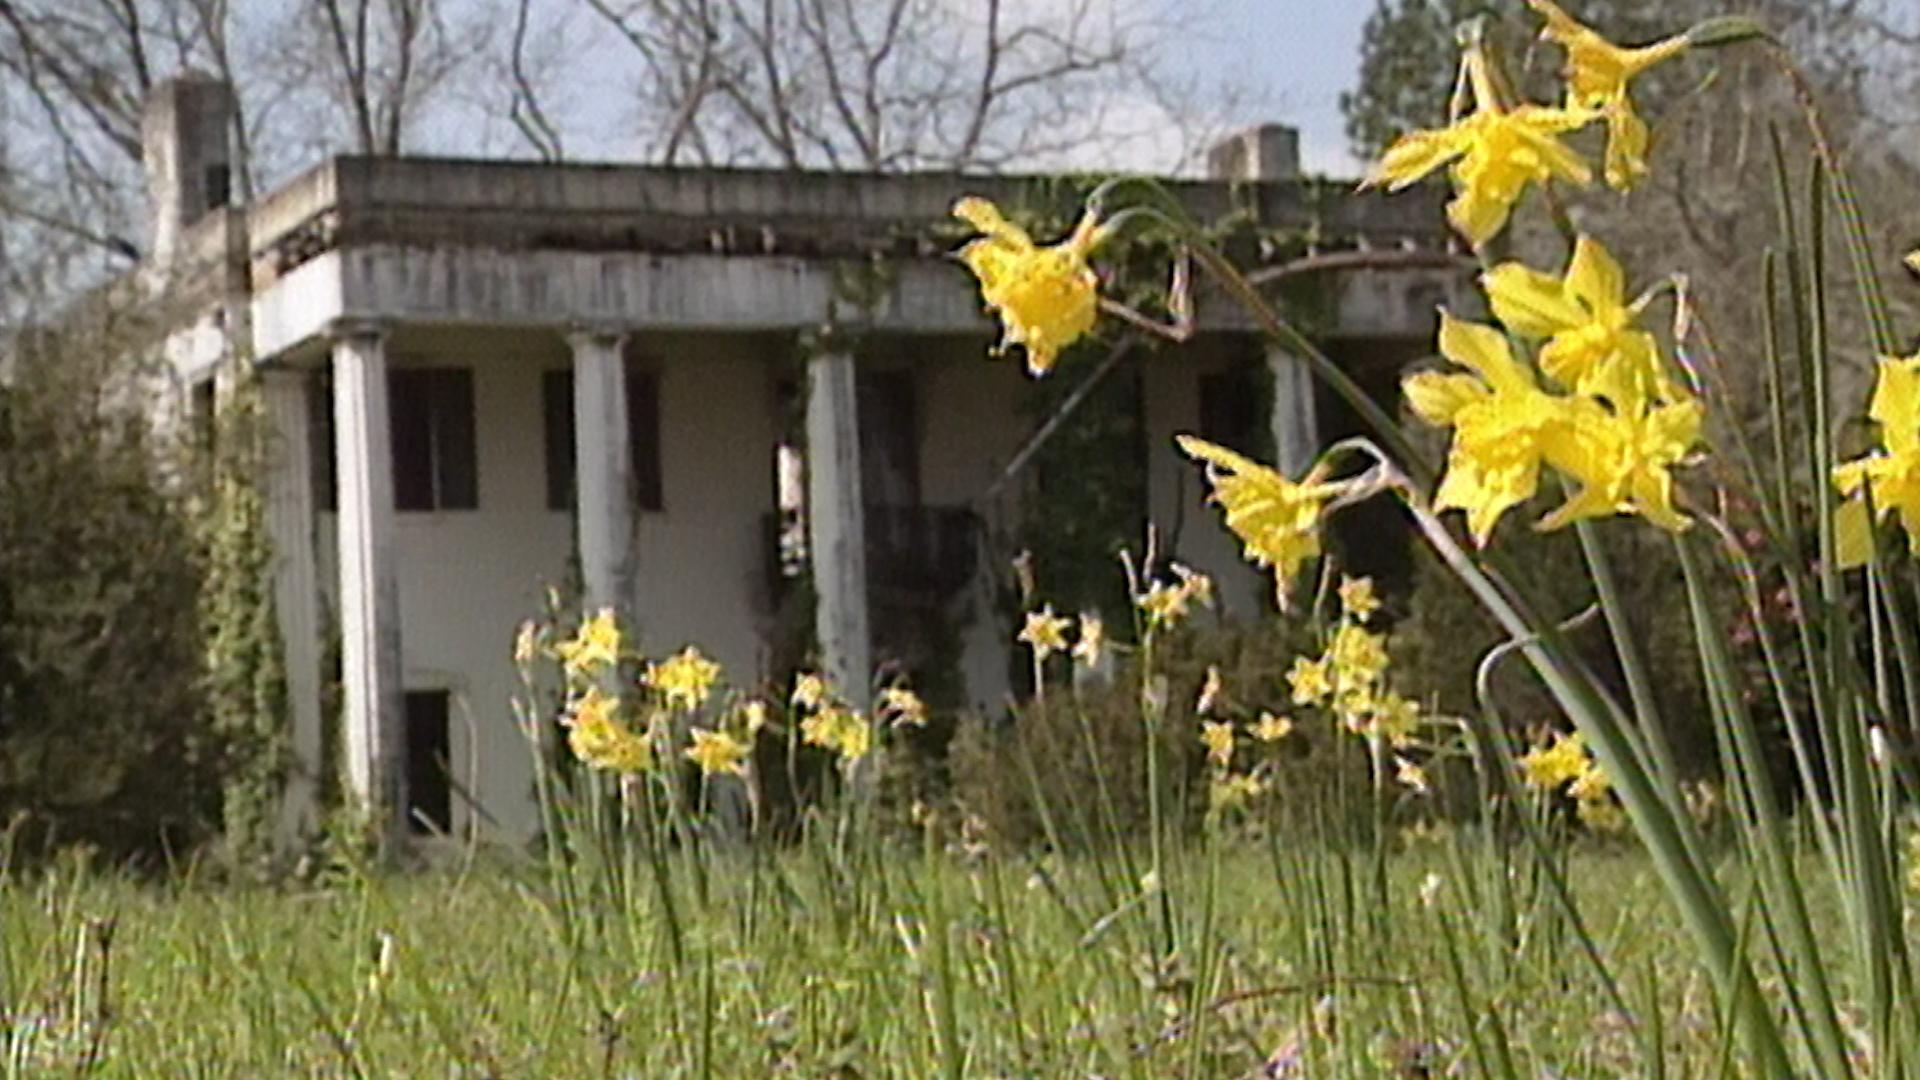 Sweet Home Alabama – 19th century homes in Alabama